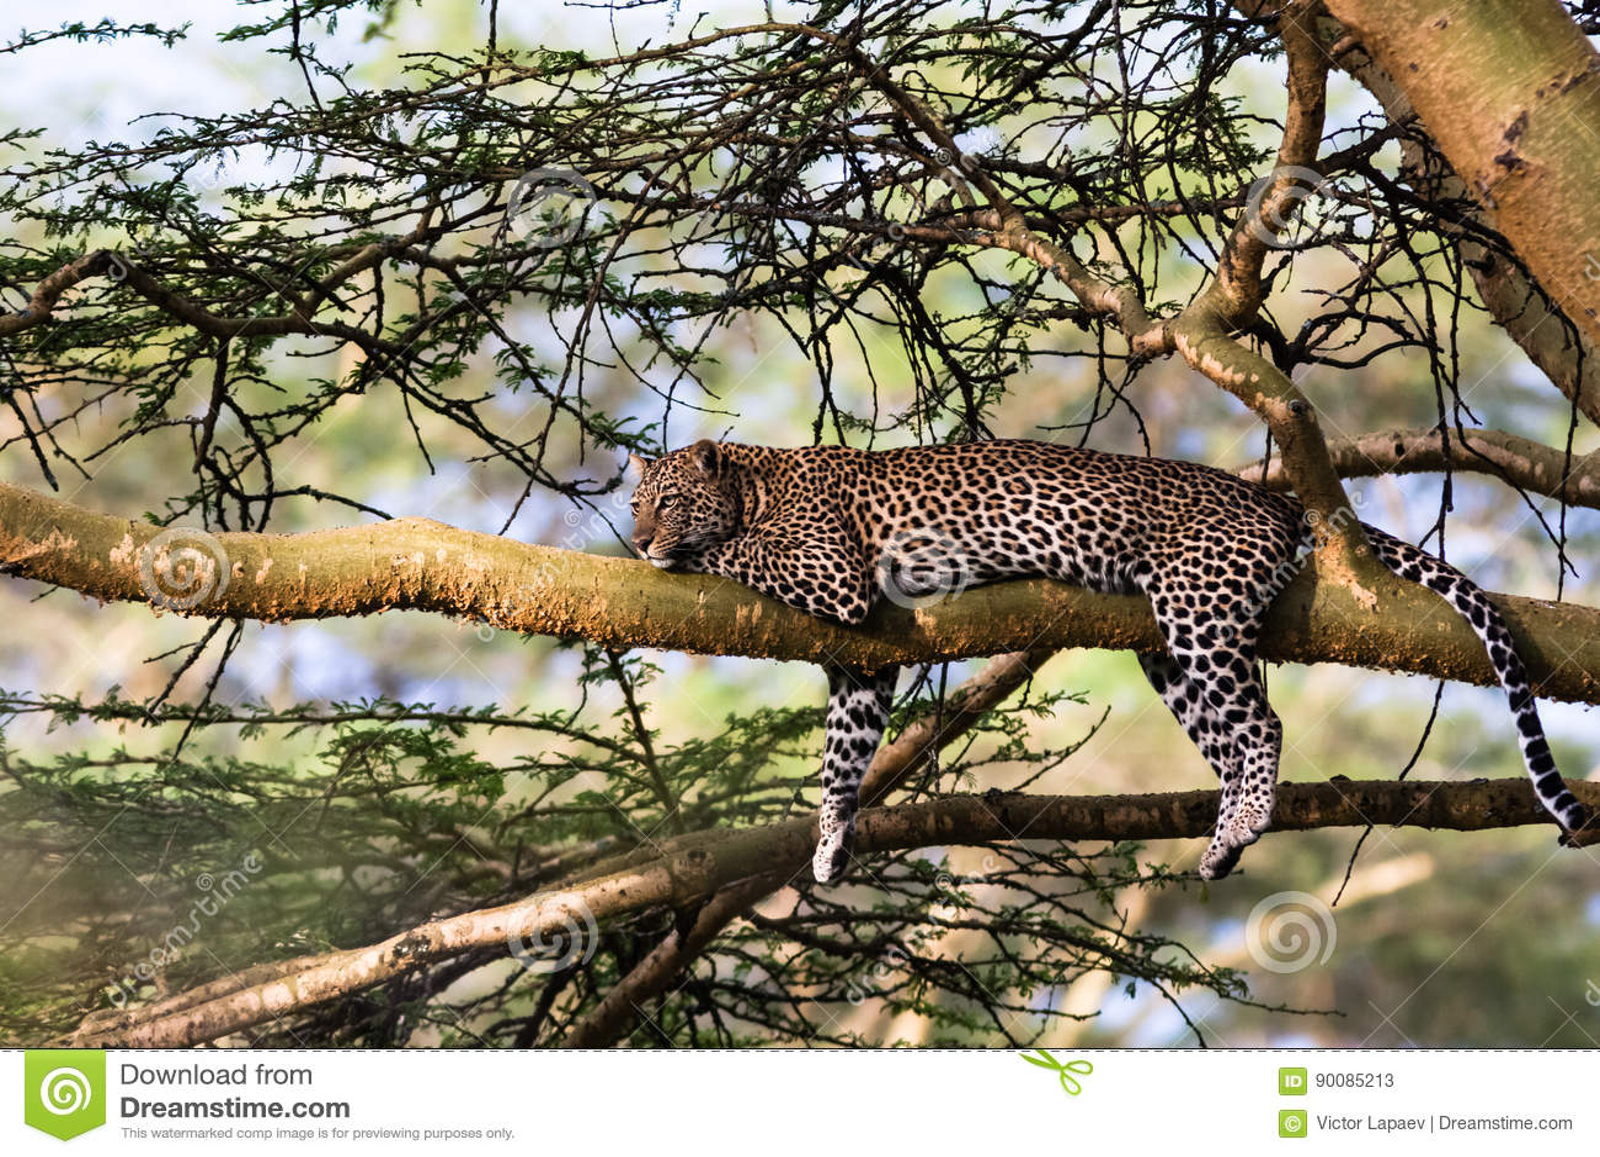 Portrait of a leopard resting on a tree. Nakuru, Africa